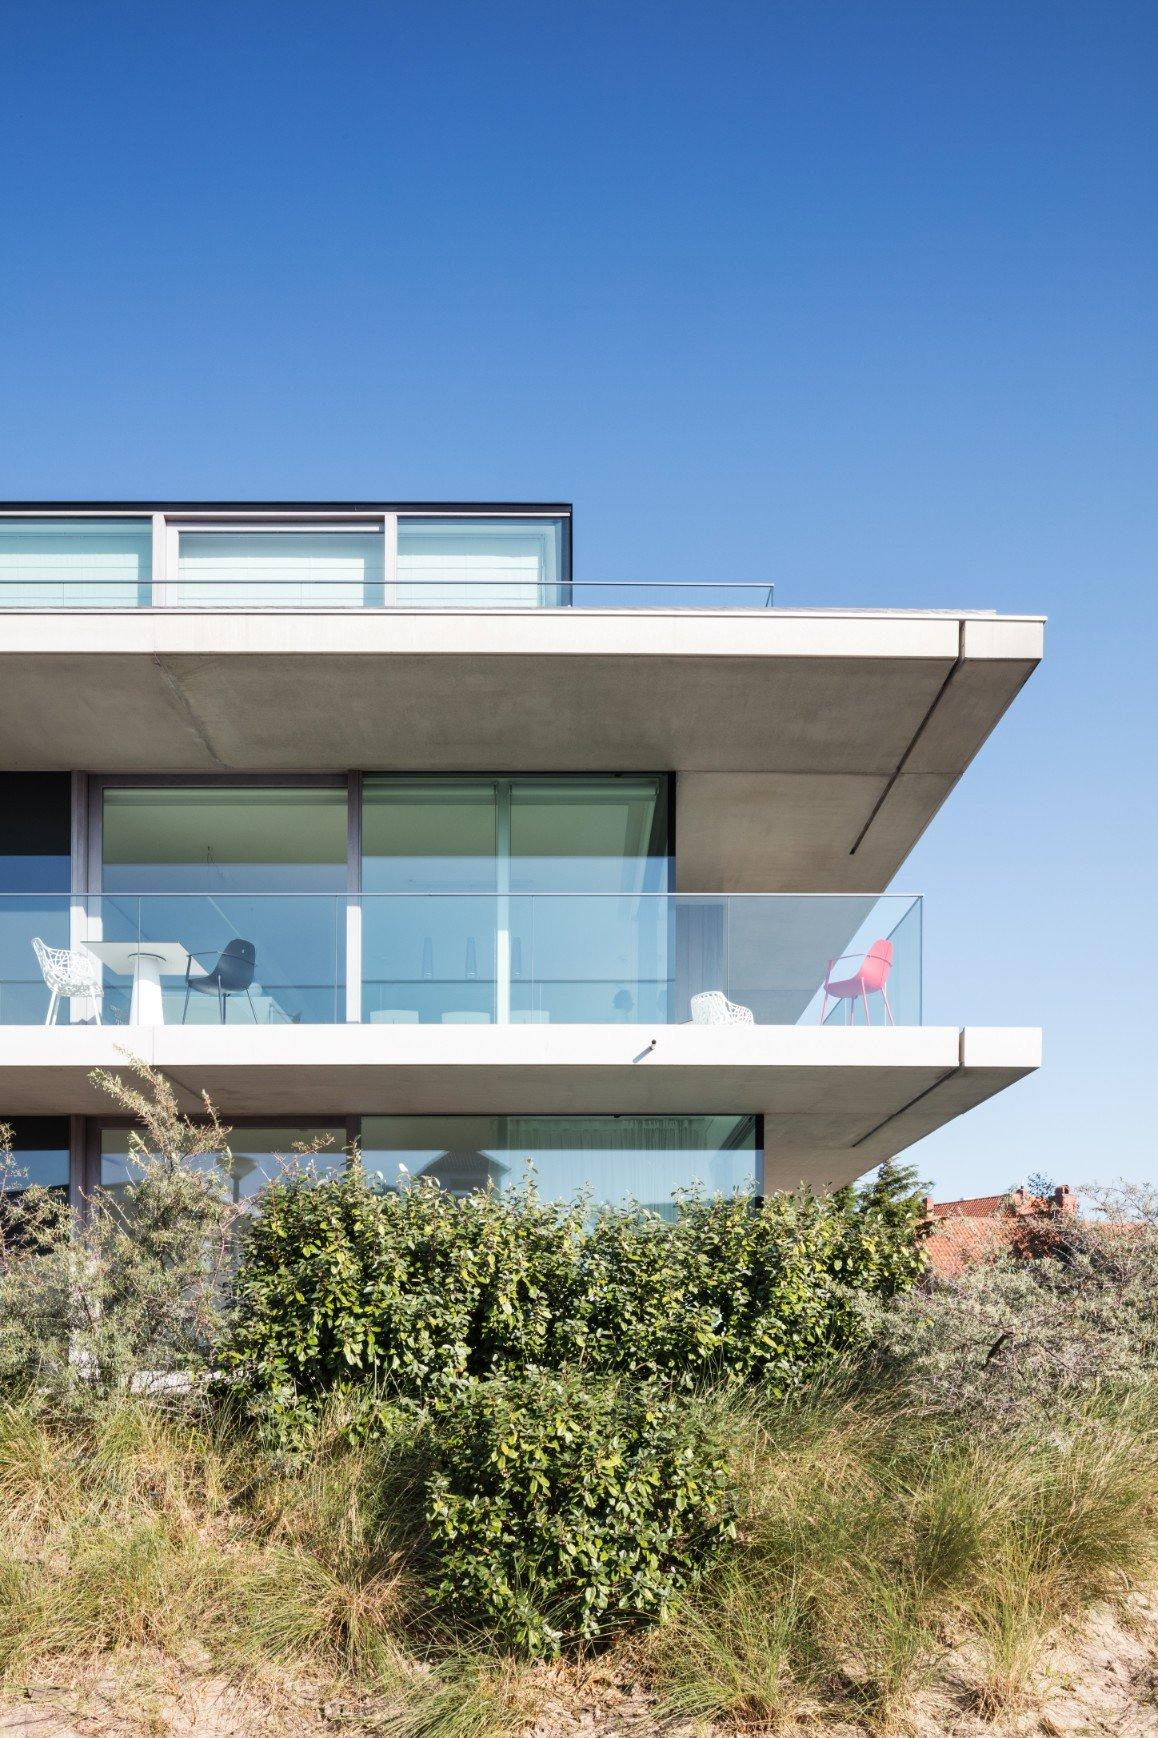 Rietveldprojects.be-Twins-Gropius-Breuer-appartement-design-architectuur-kust8.jpg